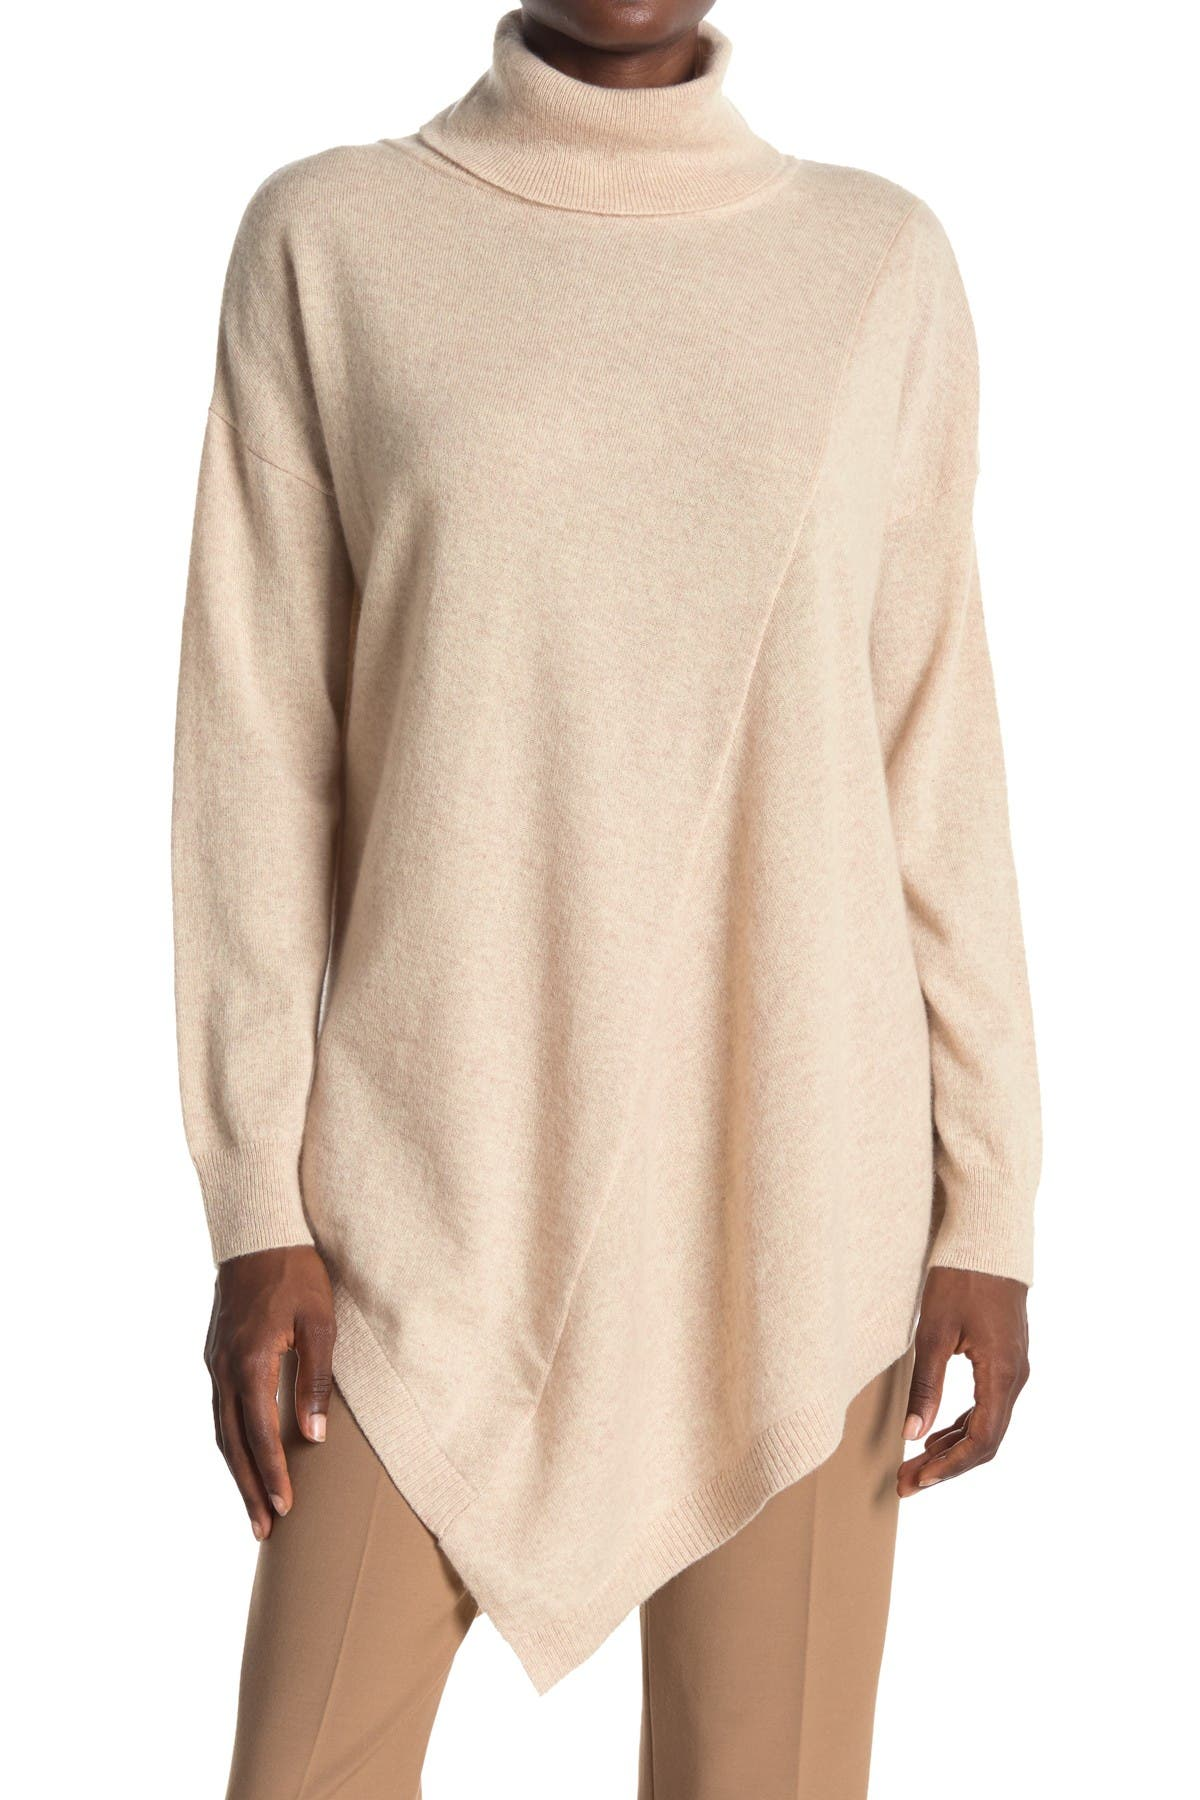 Image of Donna Karan Cowl Neck Asymmetric Hem Cashmere Sweater